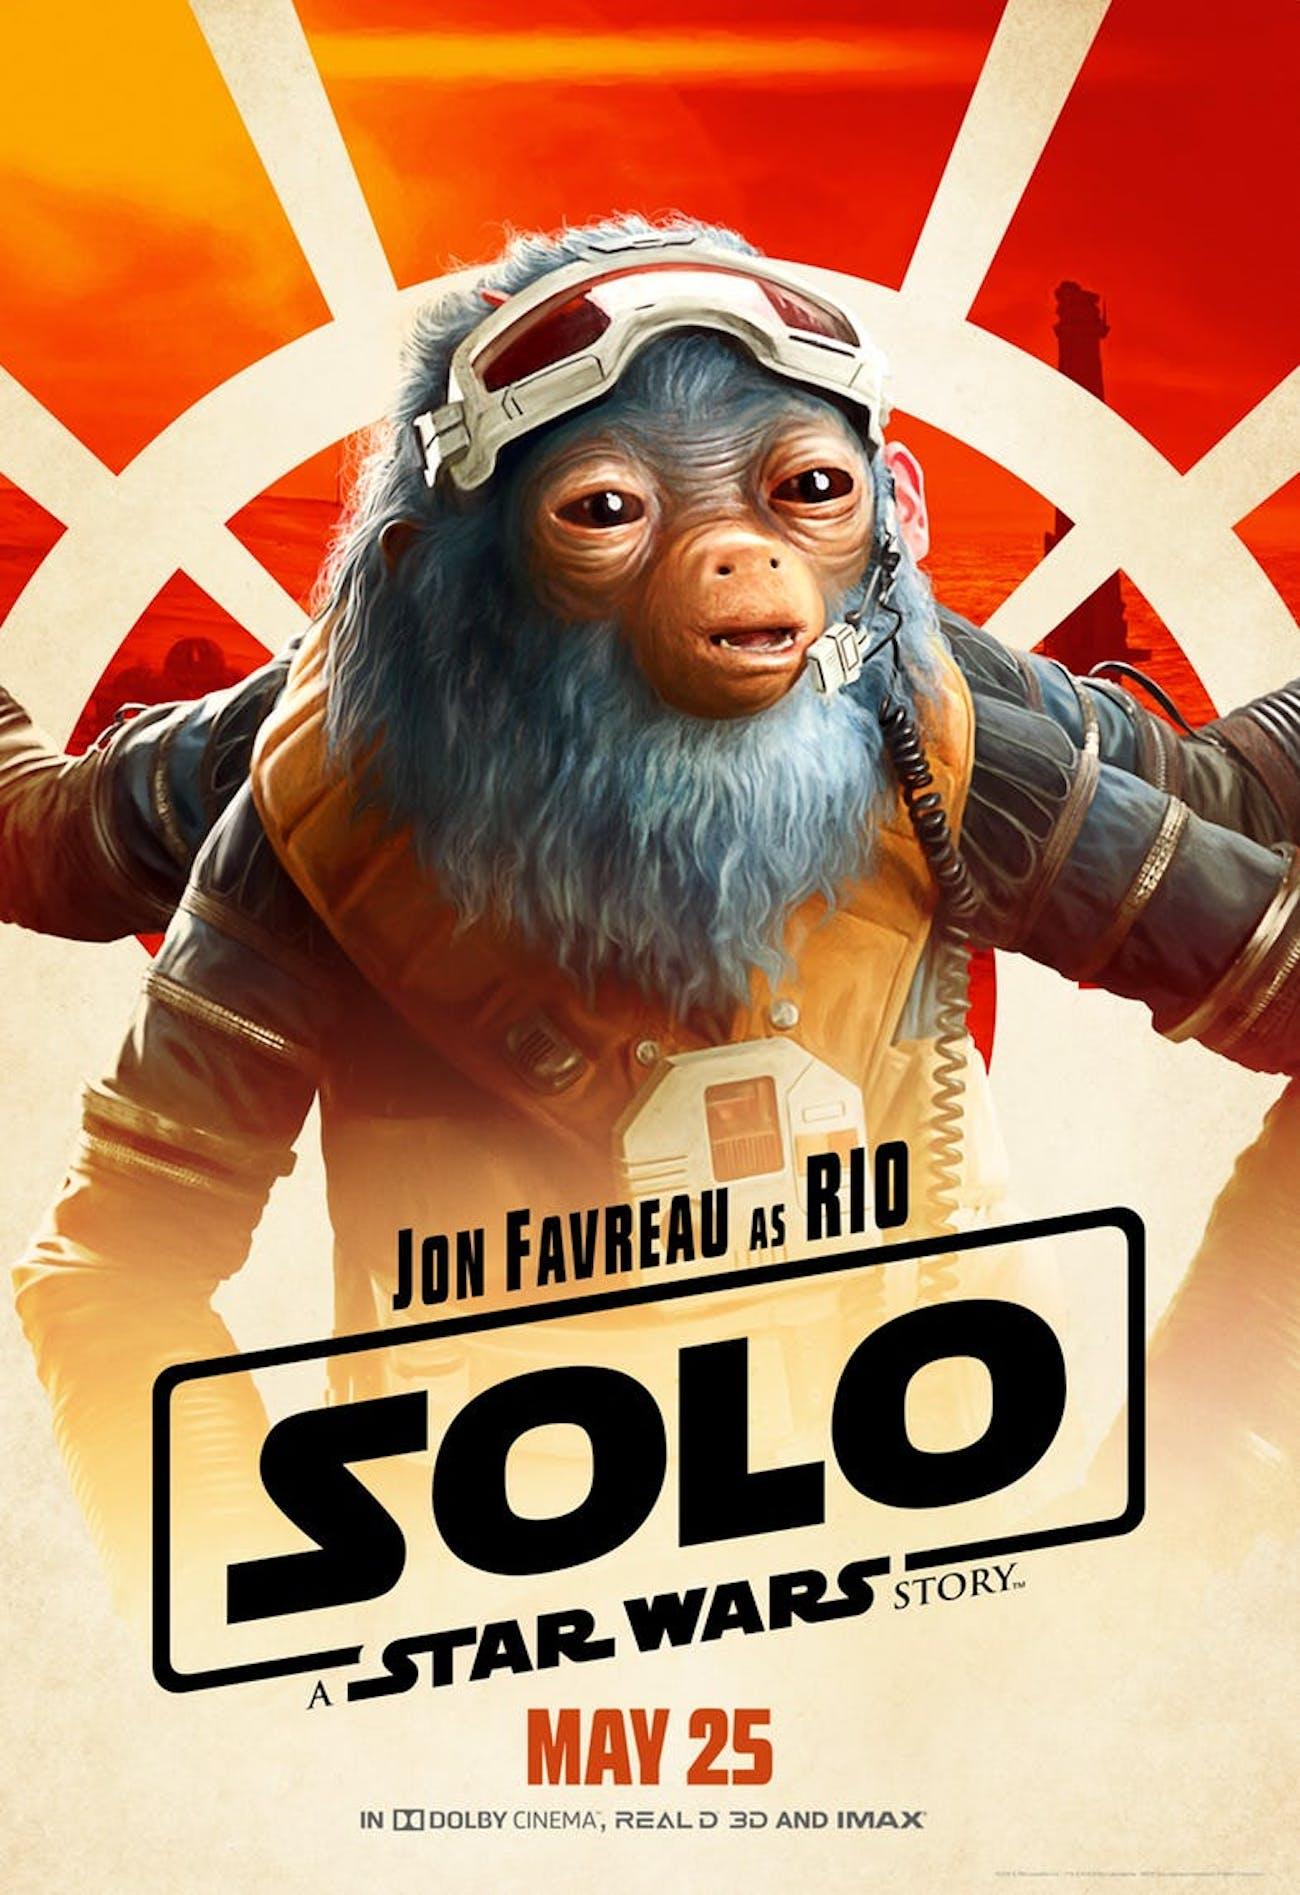 Jon Favreau as Rio Durant in 'Solo: A Star Wars Story'.